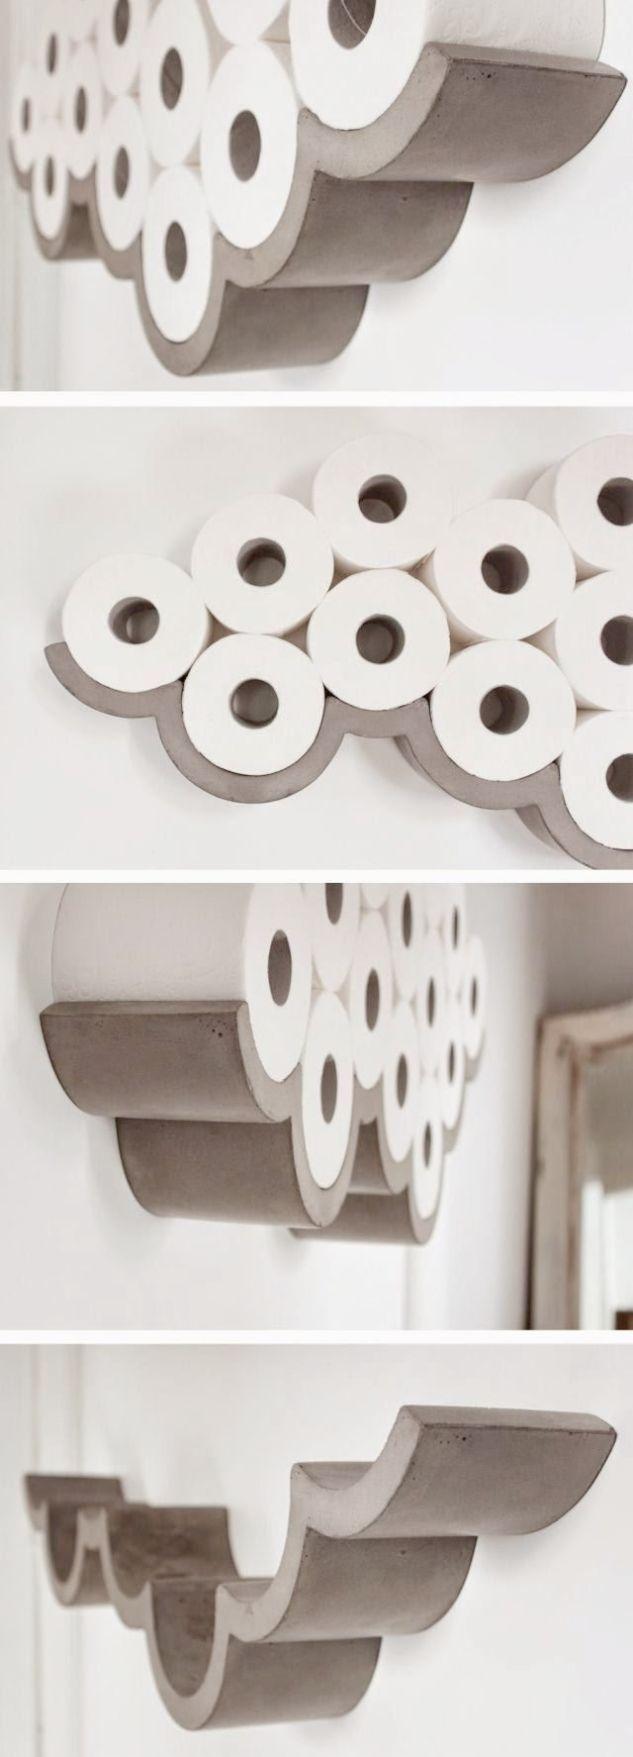 Decorating Little Bathrooms Designing Gender Neutral Bathrooms